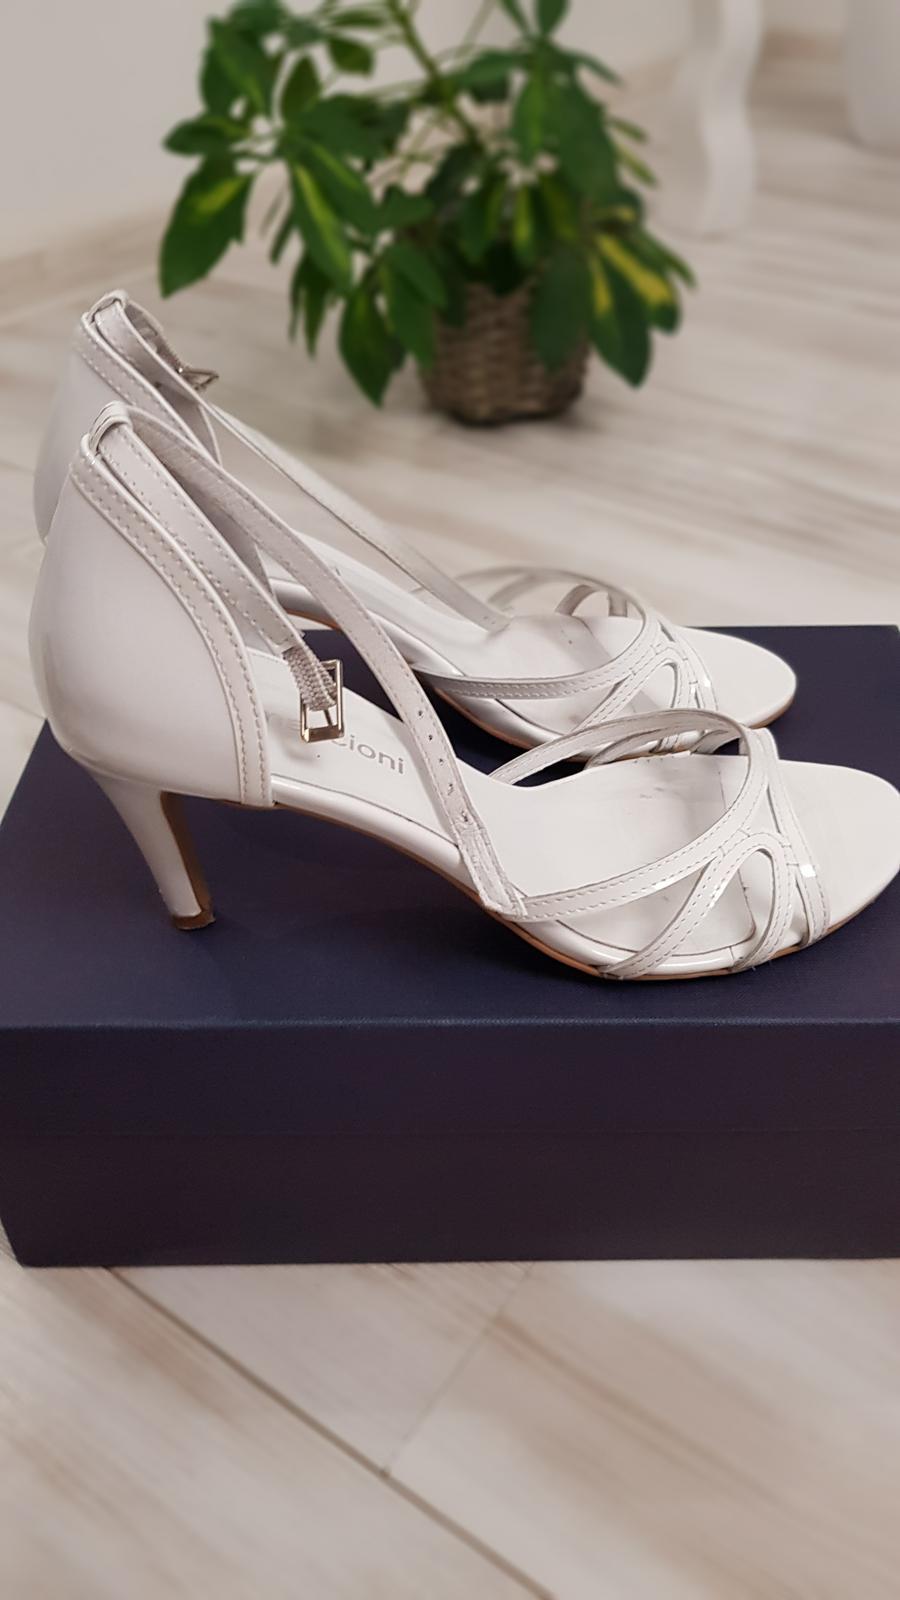 Svadobné topánky značky Maccioni - Obrázok č. 1